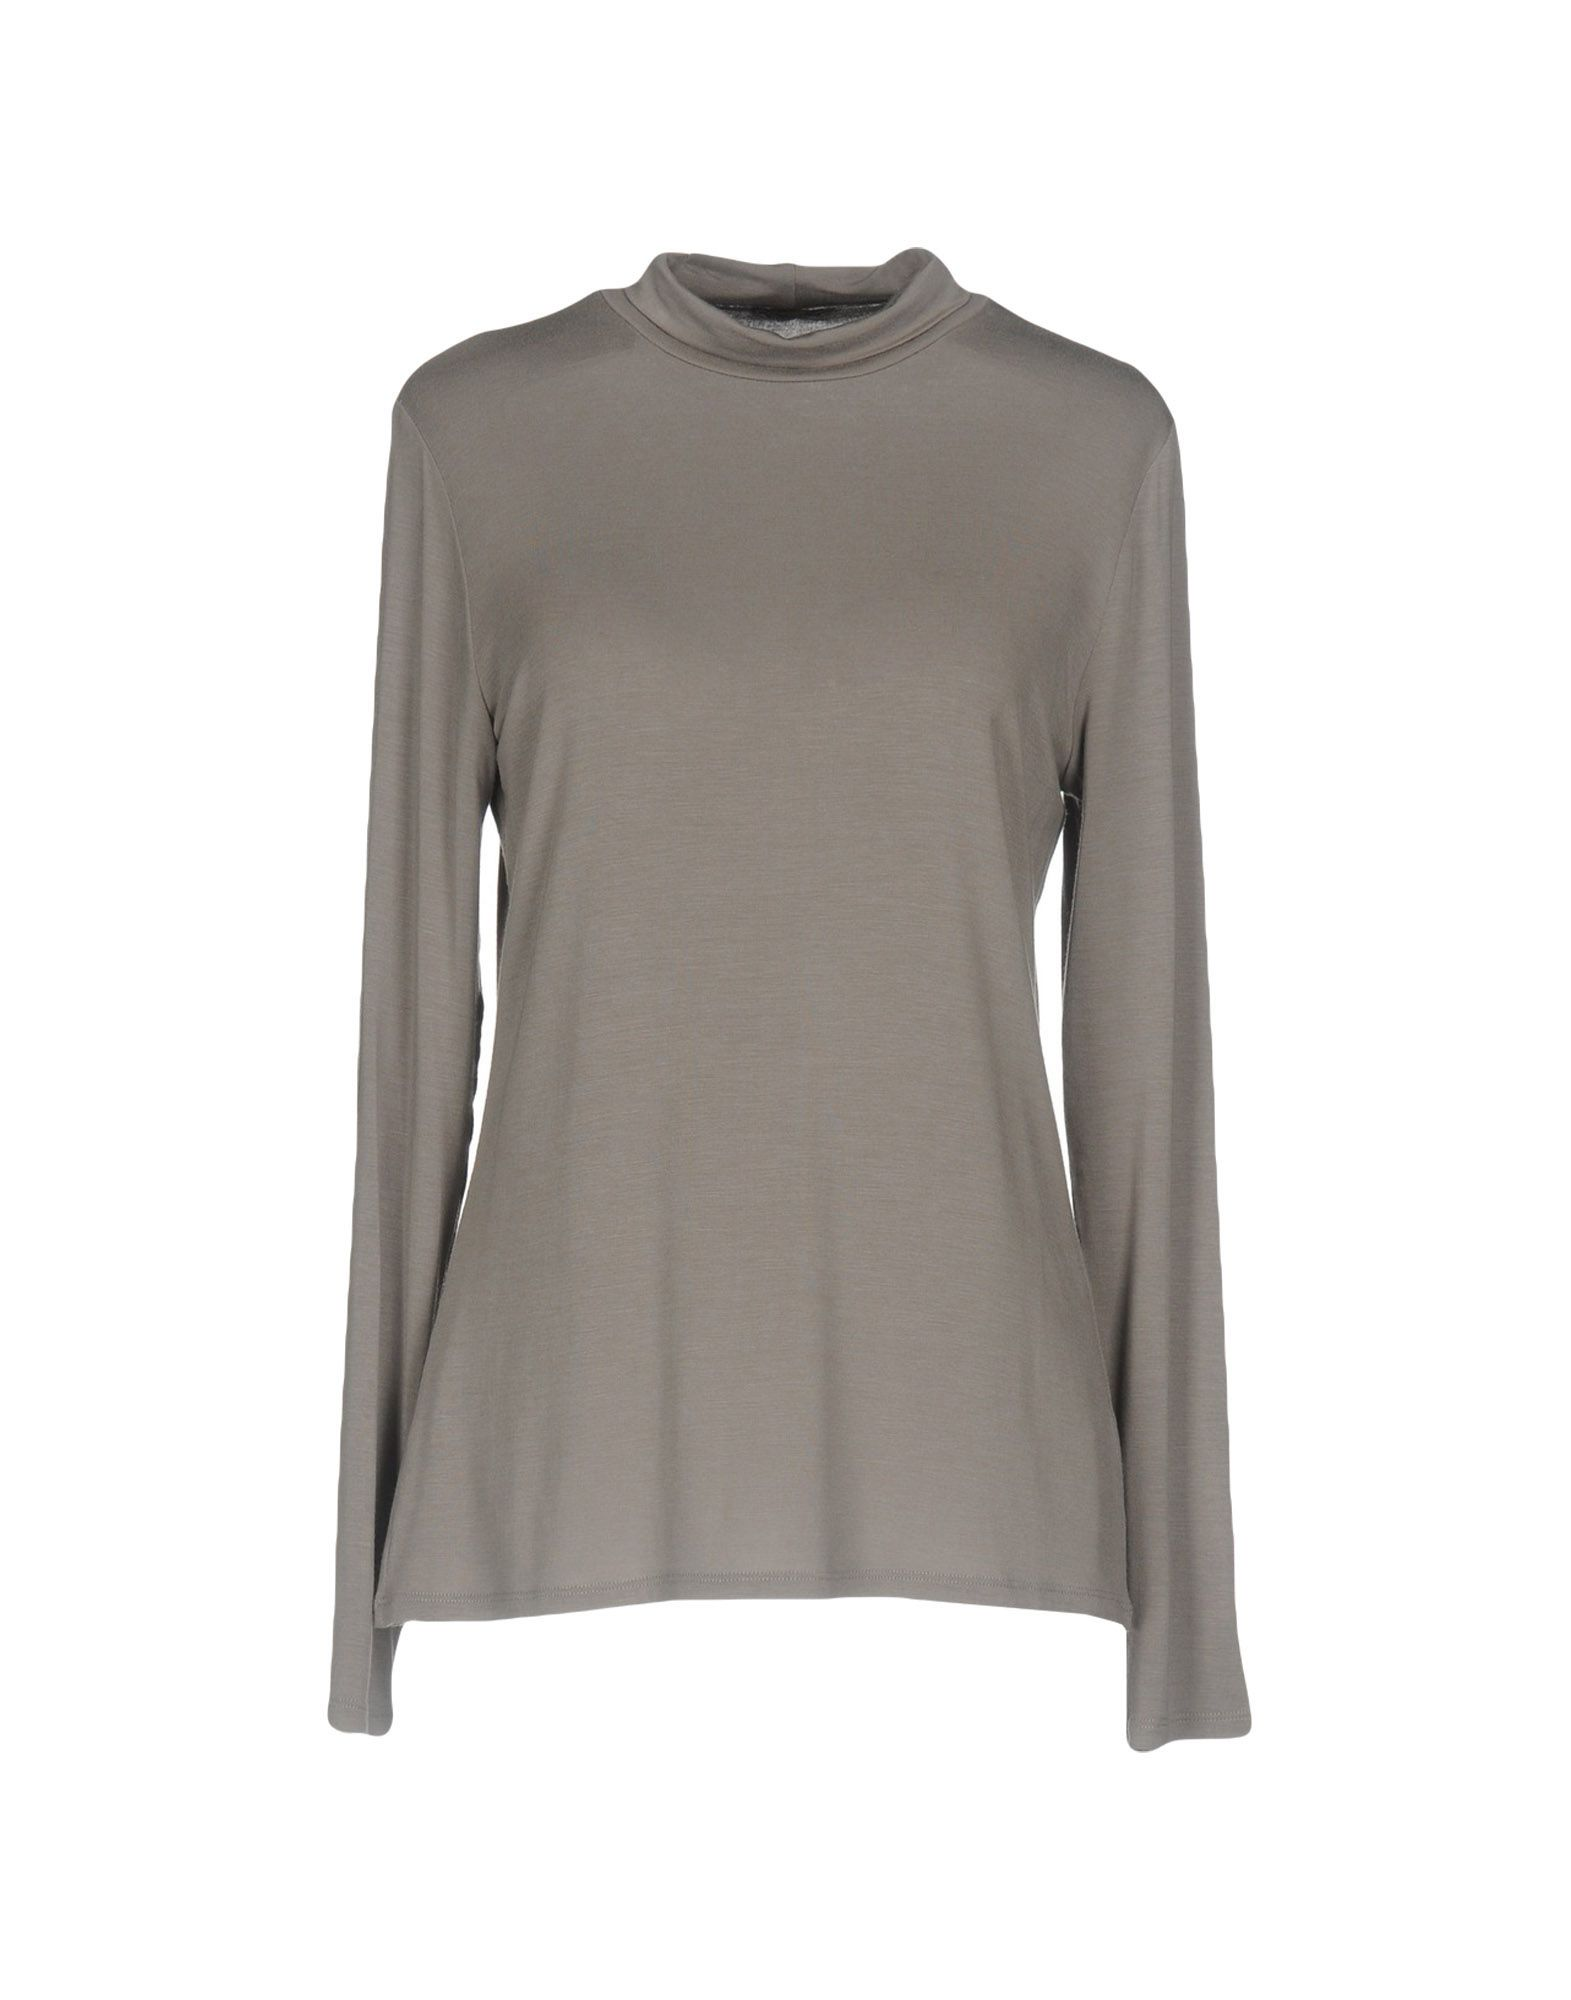 GUARDAROBA by ANIYE BY Damen T-shirts Farbe Grau Größe 6